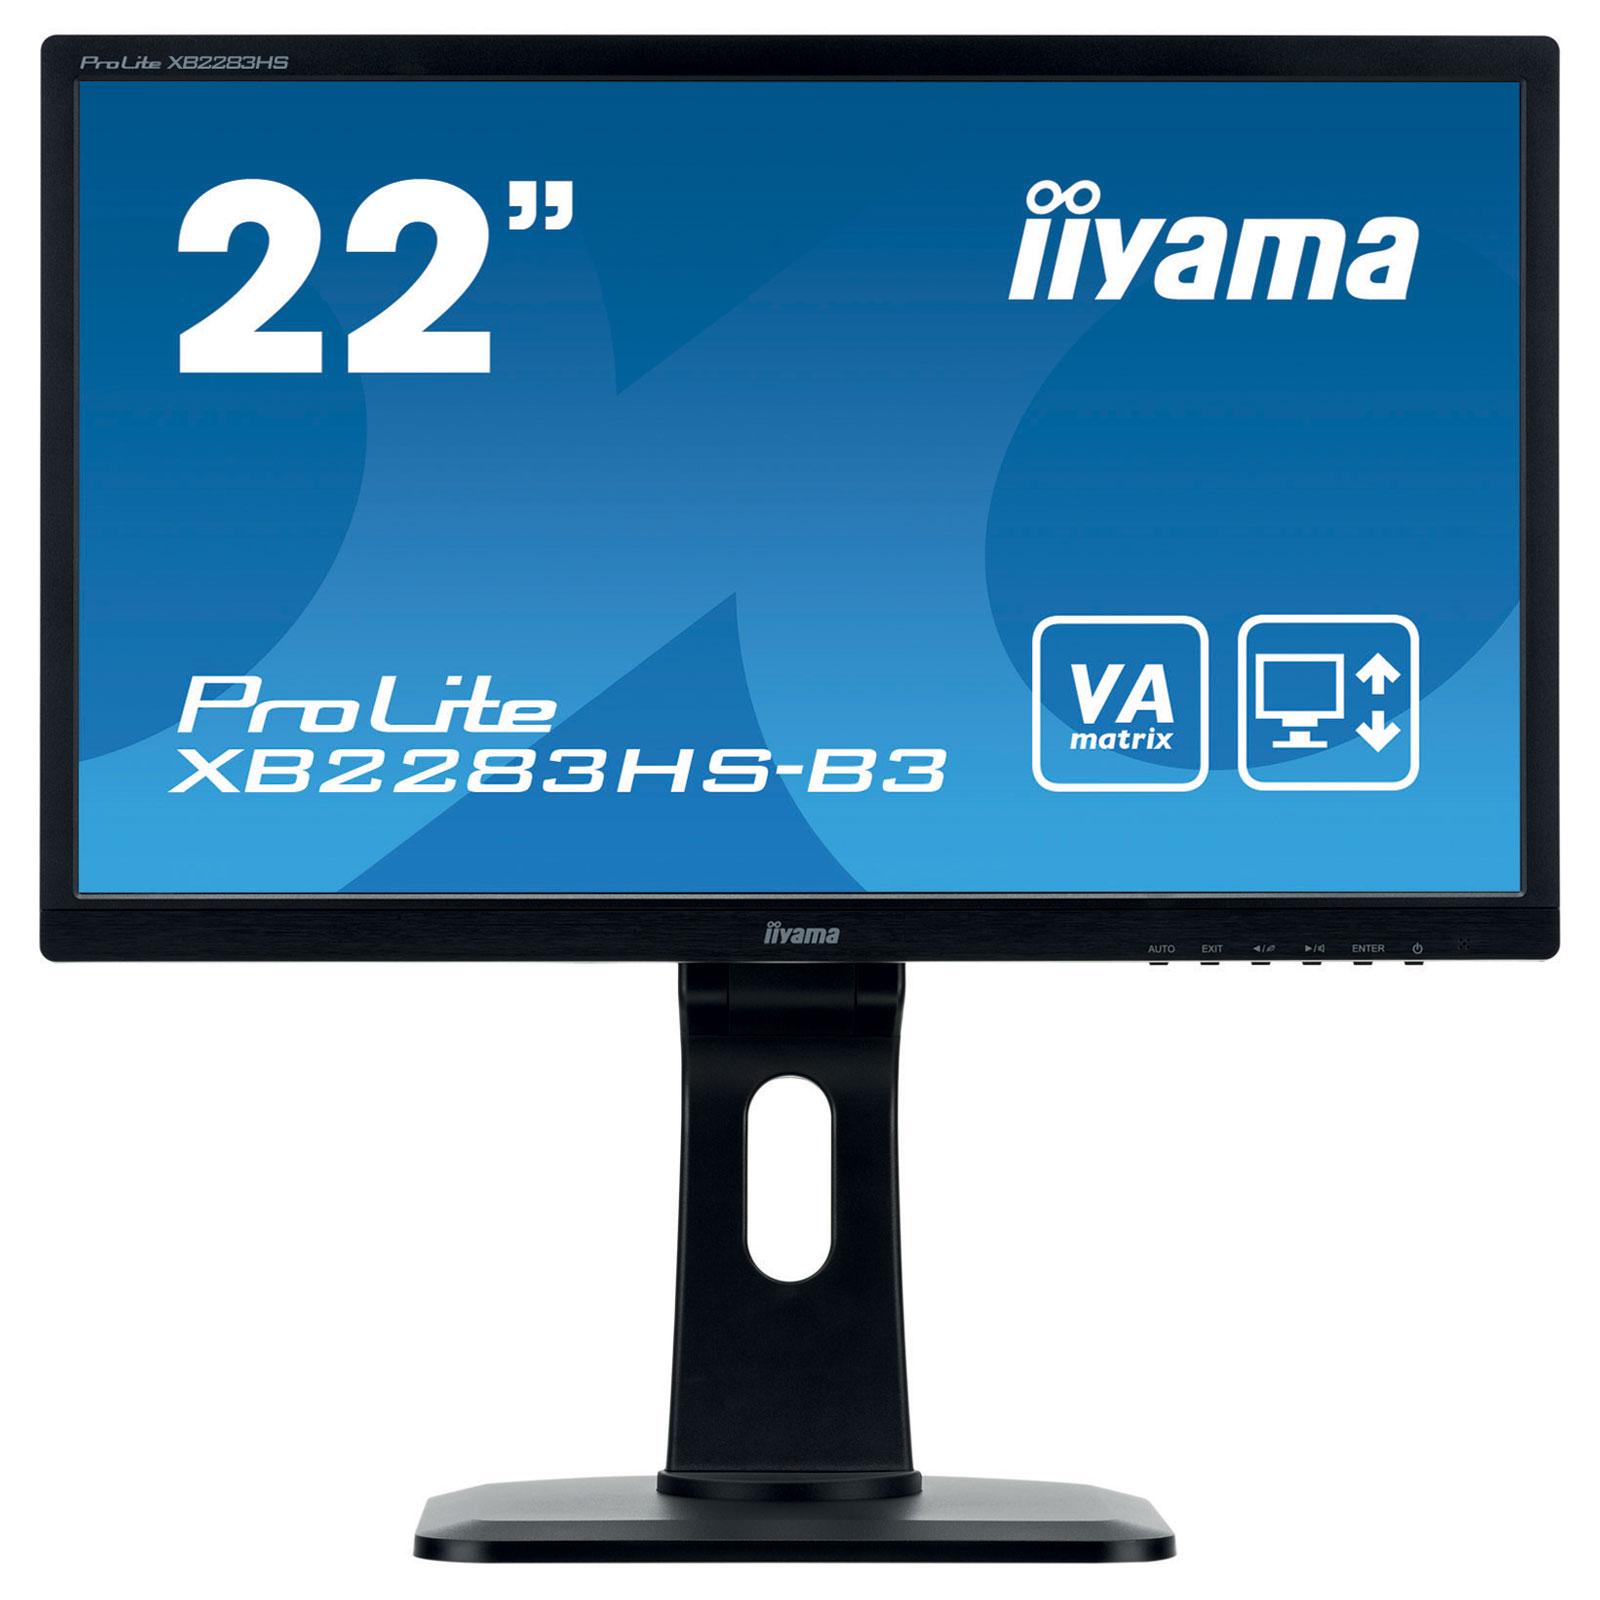 "Ecran PC iiyama 21.5"" LED - ProLite XB2283HS-B3 1920 x 1080 pixels - 4 ms (Gris à Gris) - Format large 16/9 - Dalle VA - Pivot - VGA/HDMI/DisplayPort - Noir"